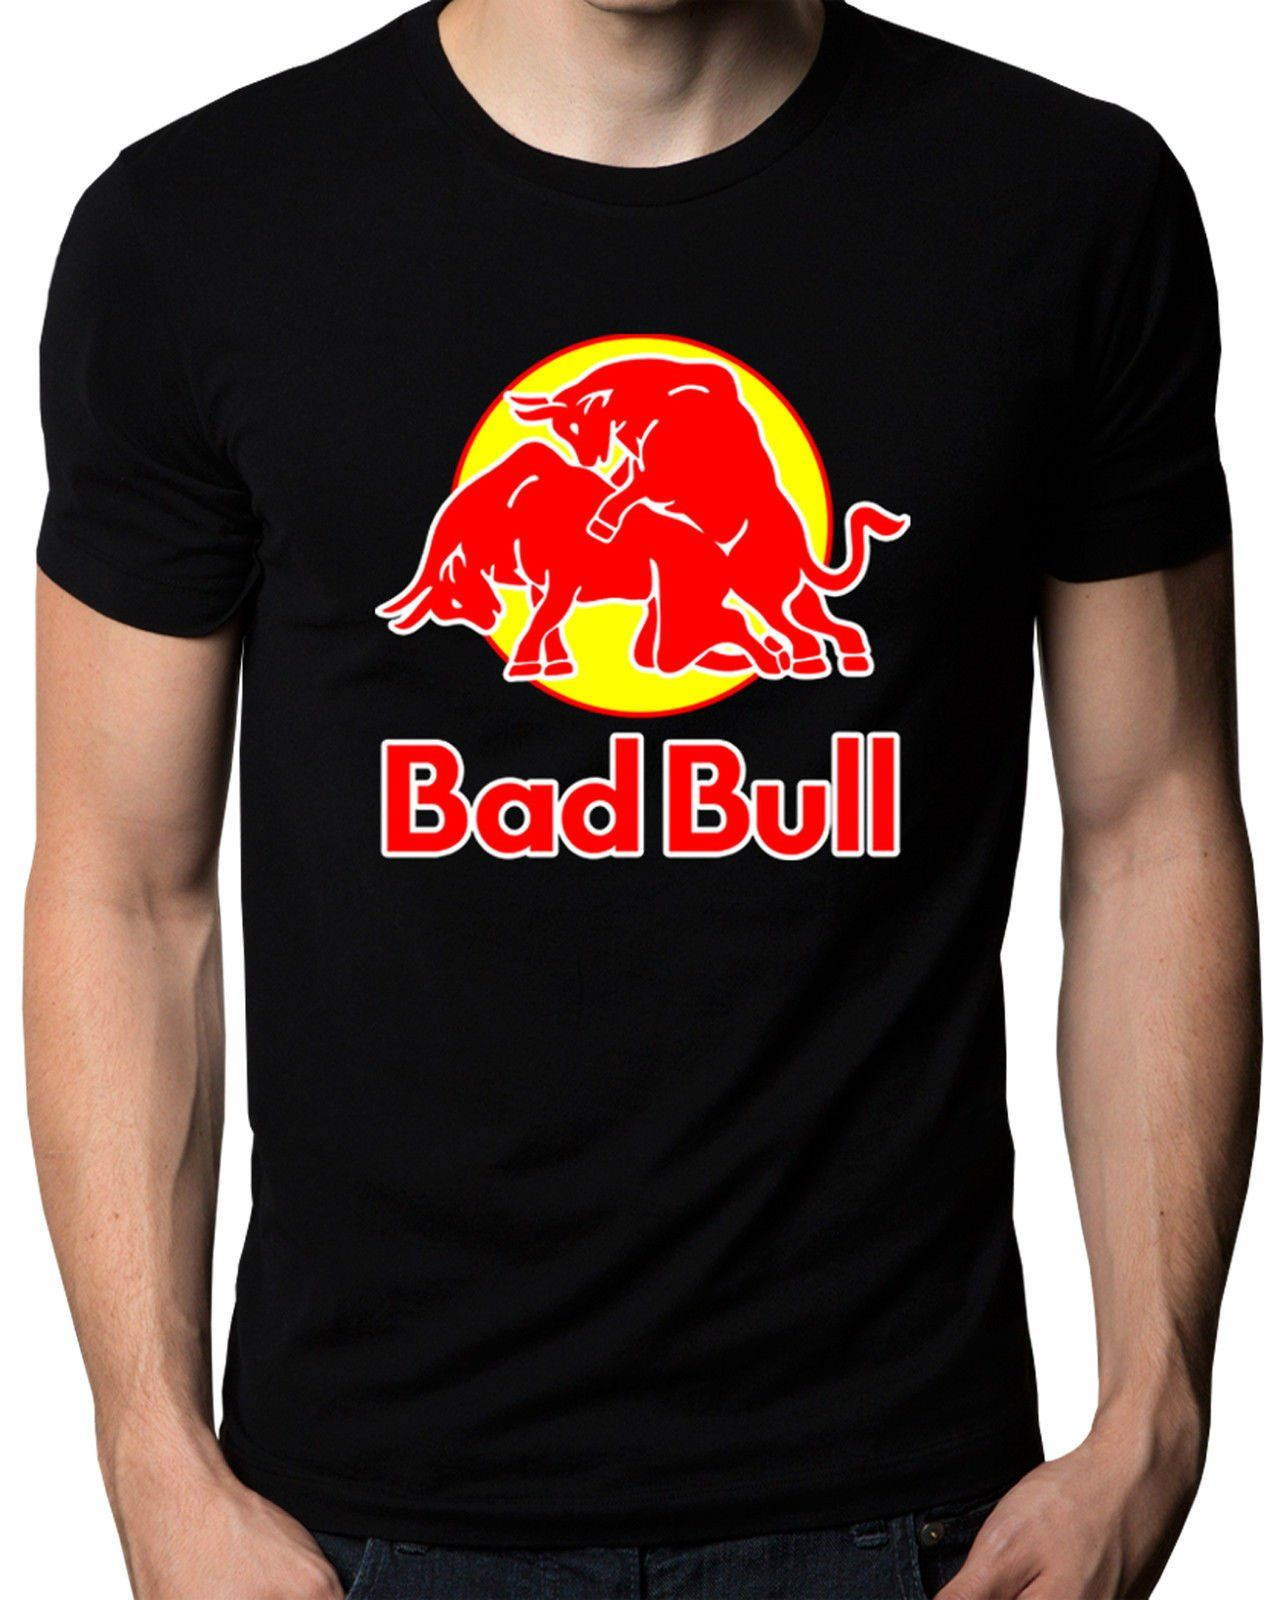 Good quality black t shirt - Bad Bull Funny Red Bull Logo Sex Graphic Parody Mens Womens T Shirt Color